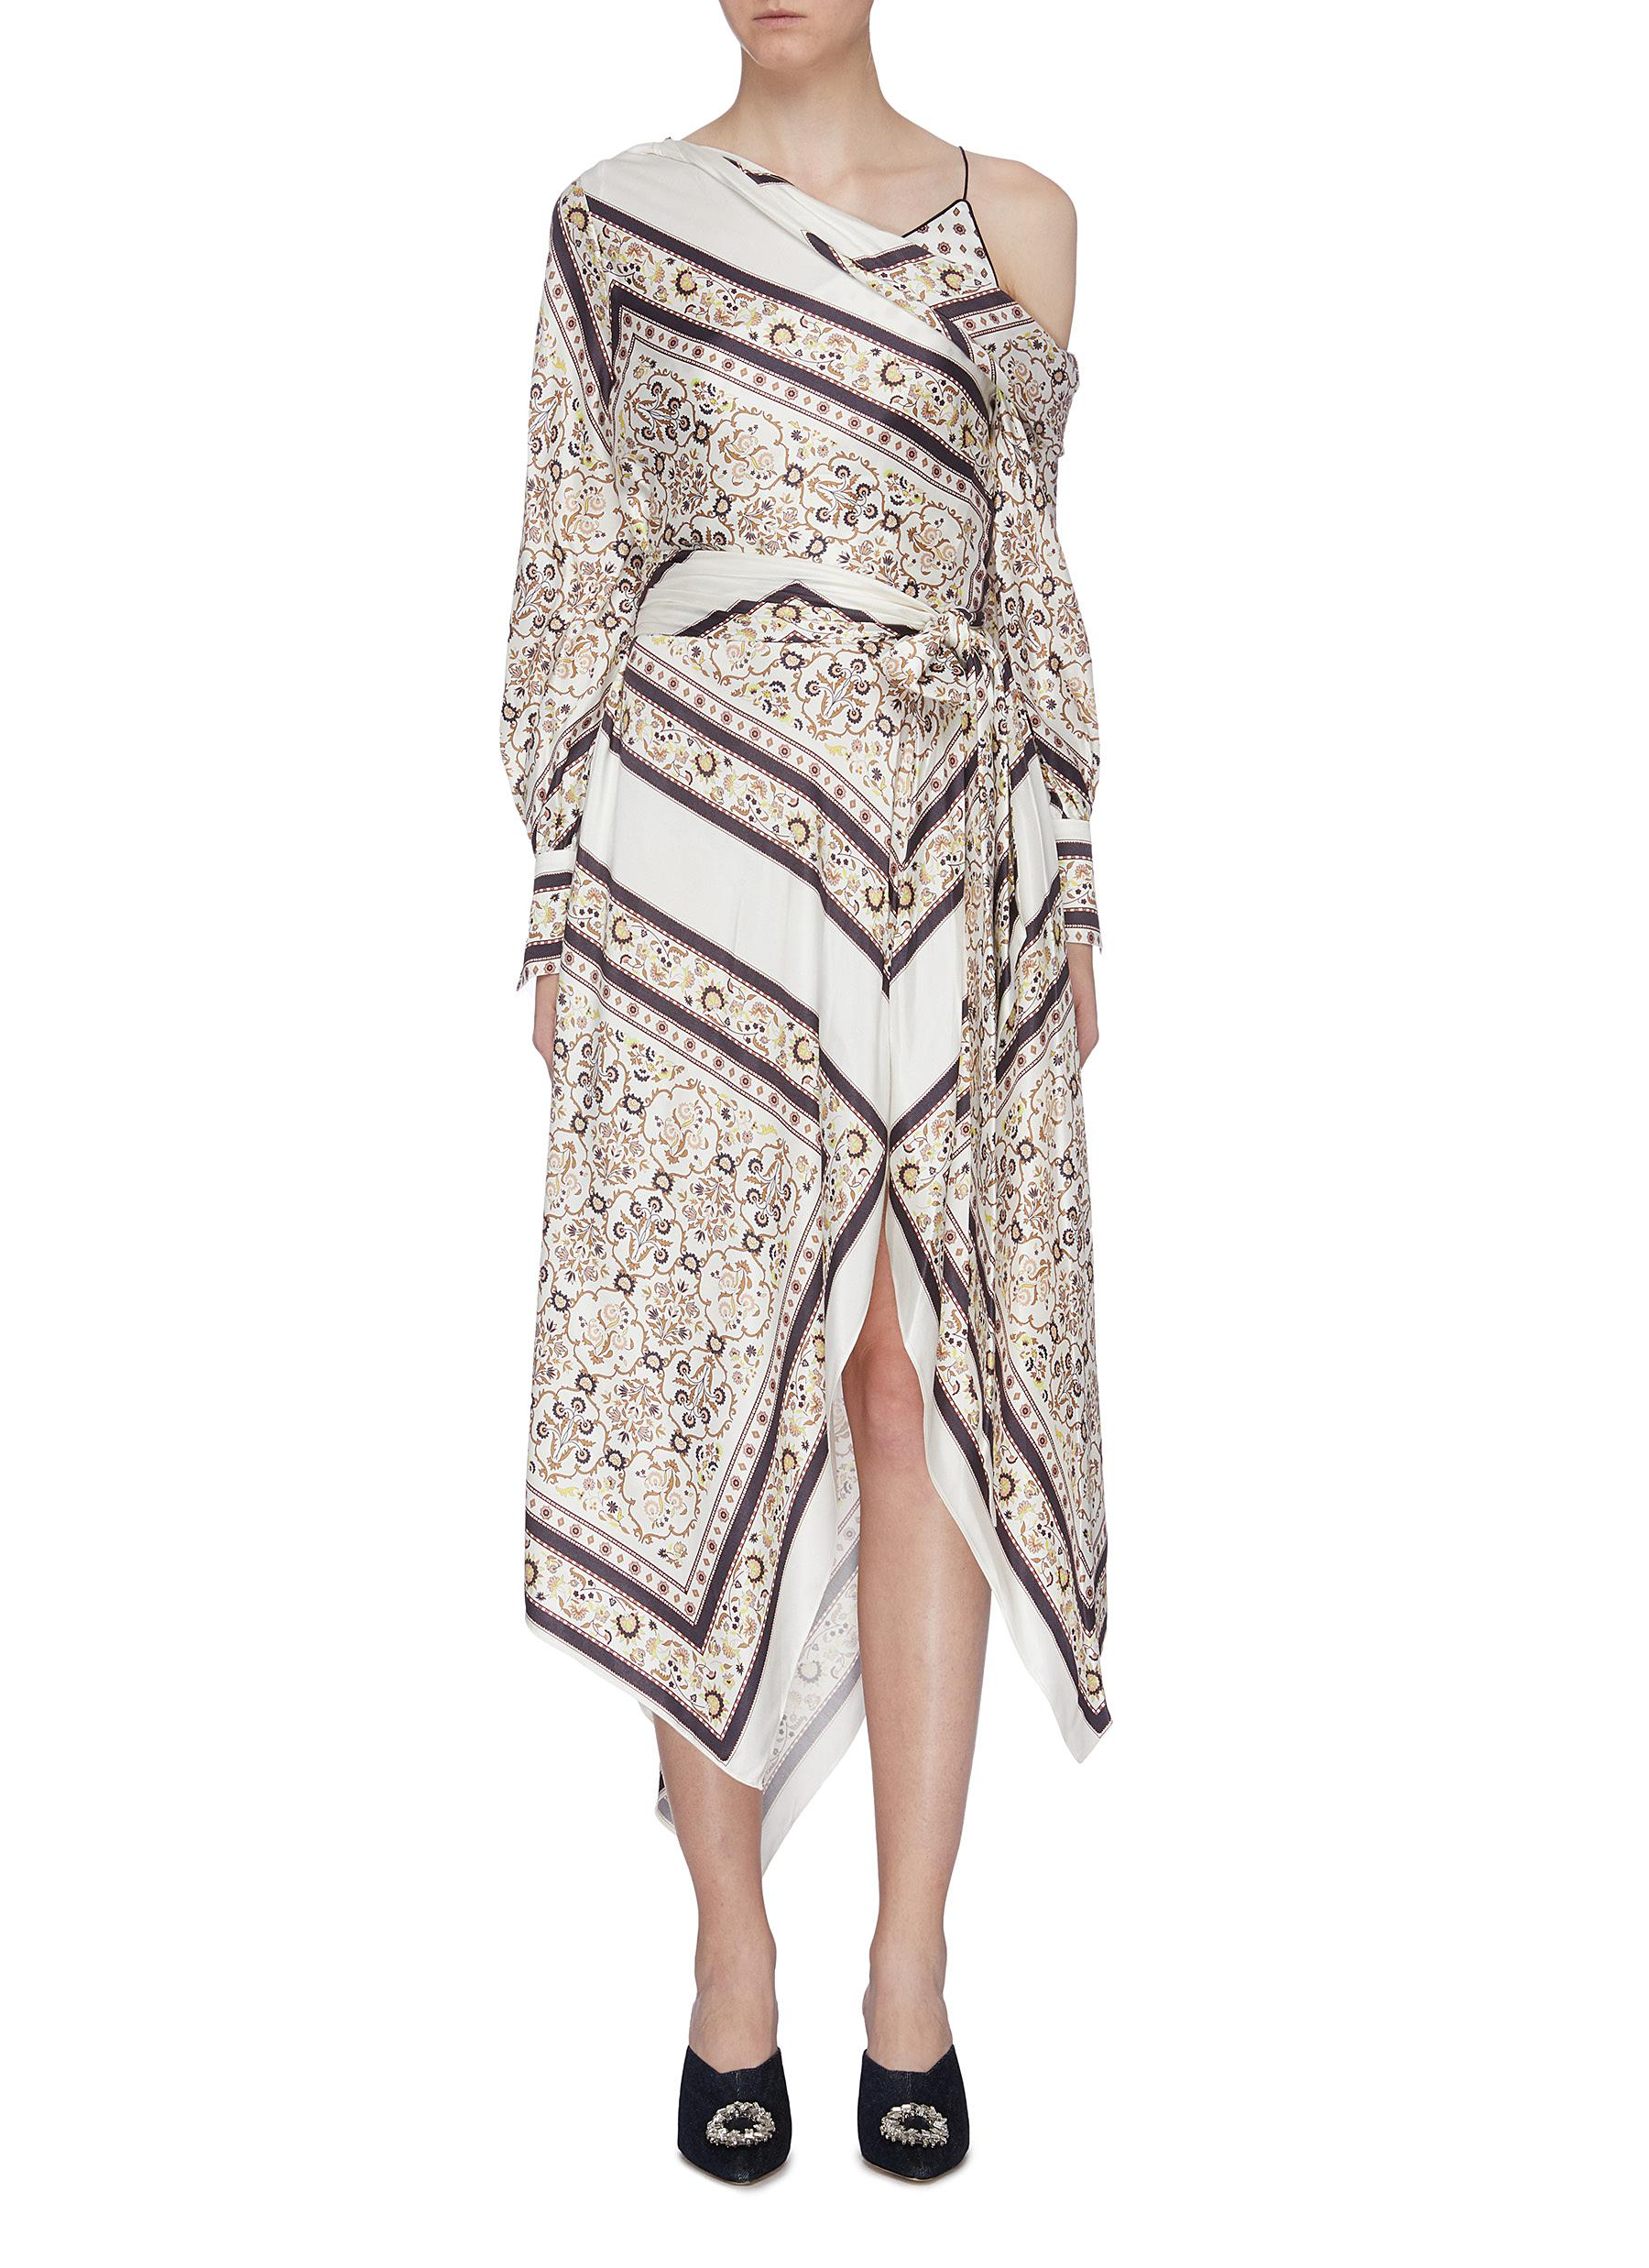 Belted scarf print one shoulder handkerchief dress by Jonathan Simkhai